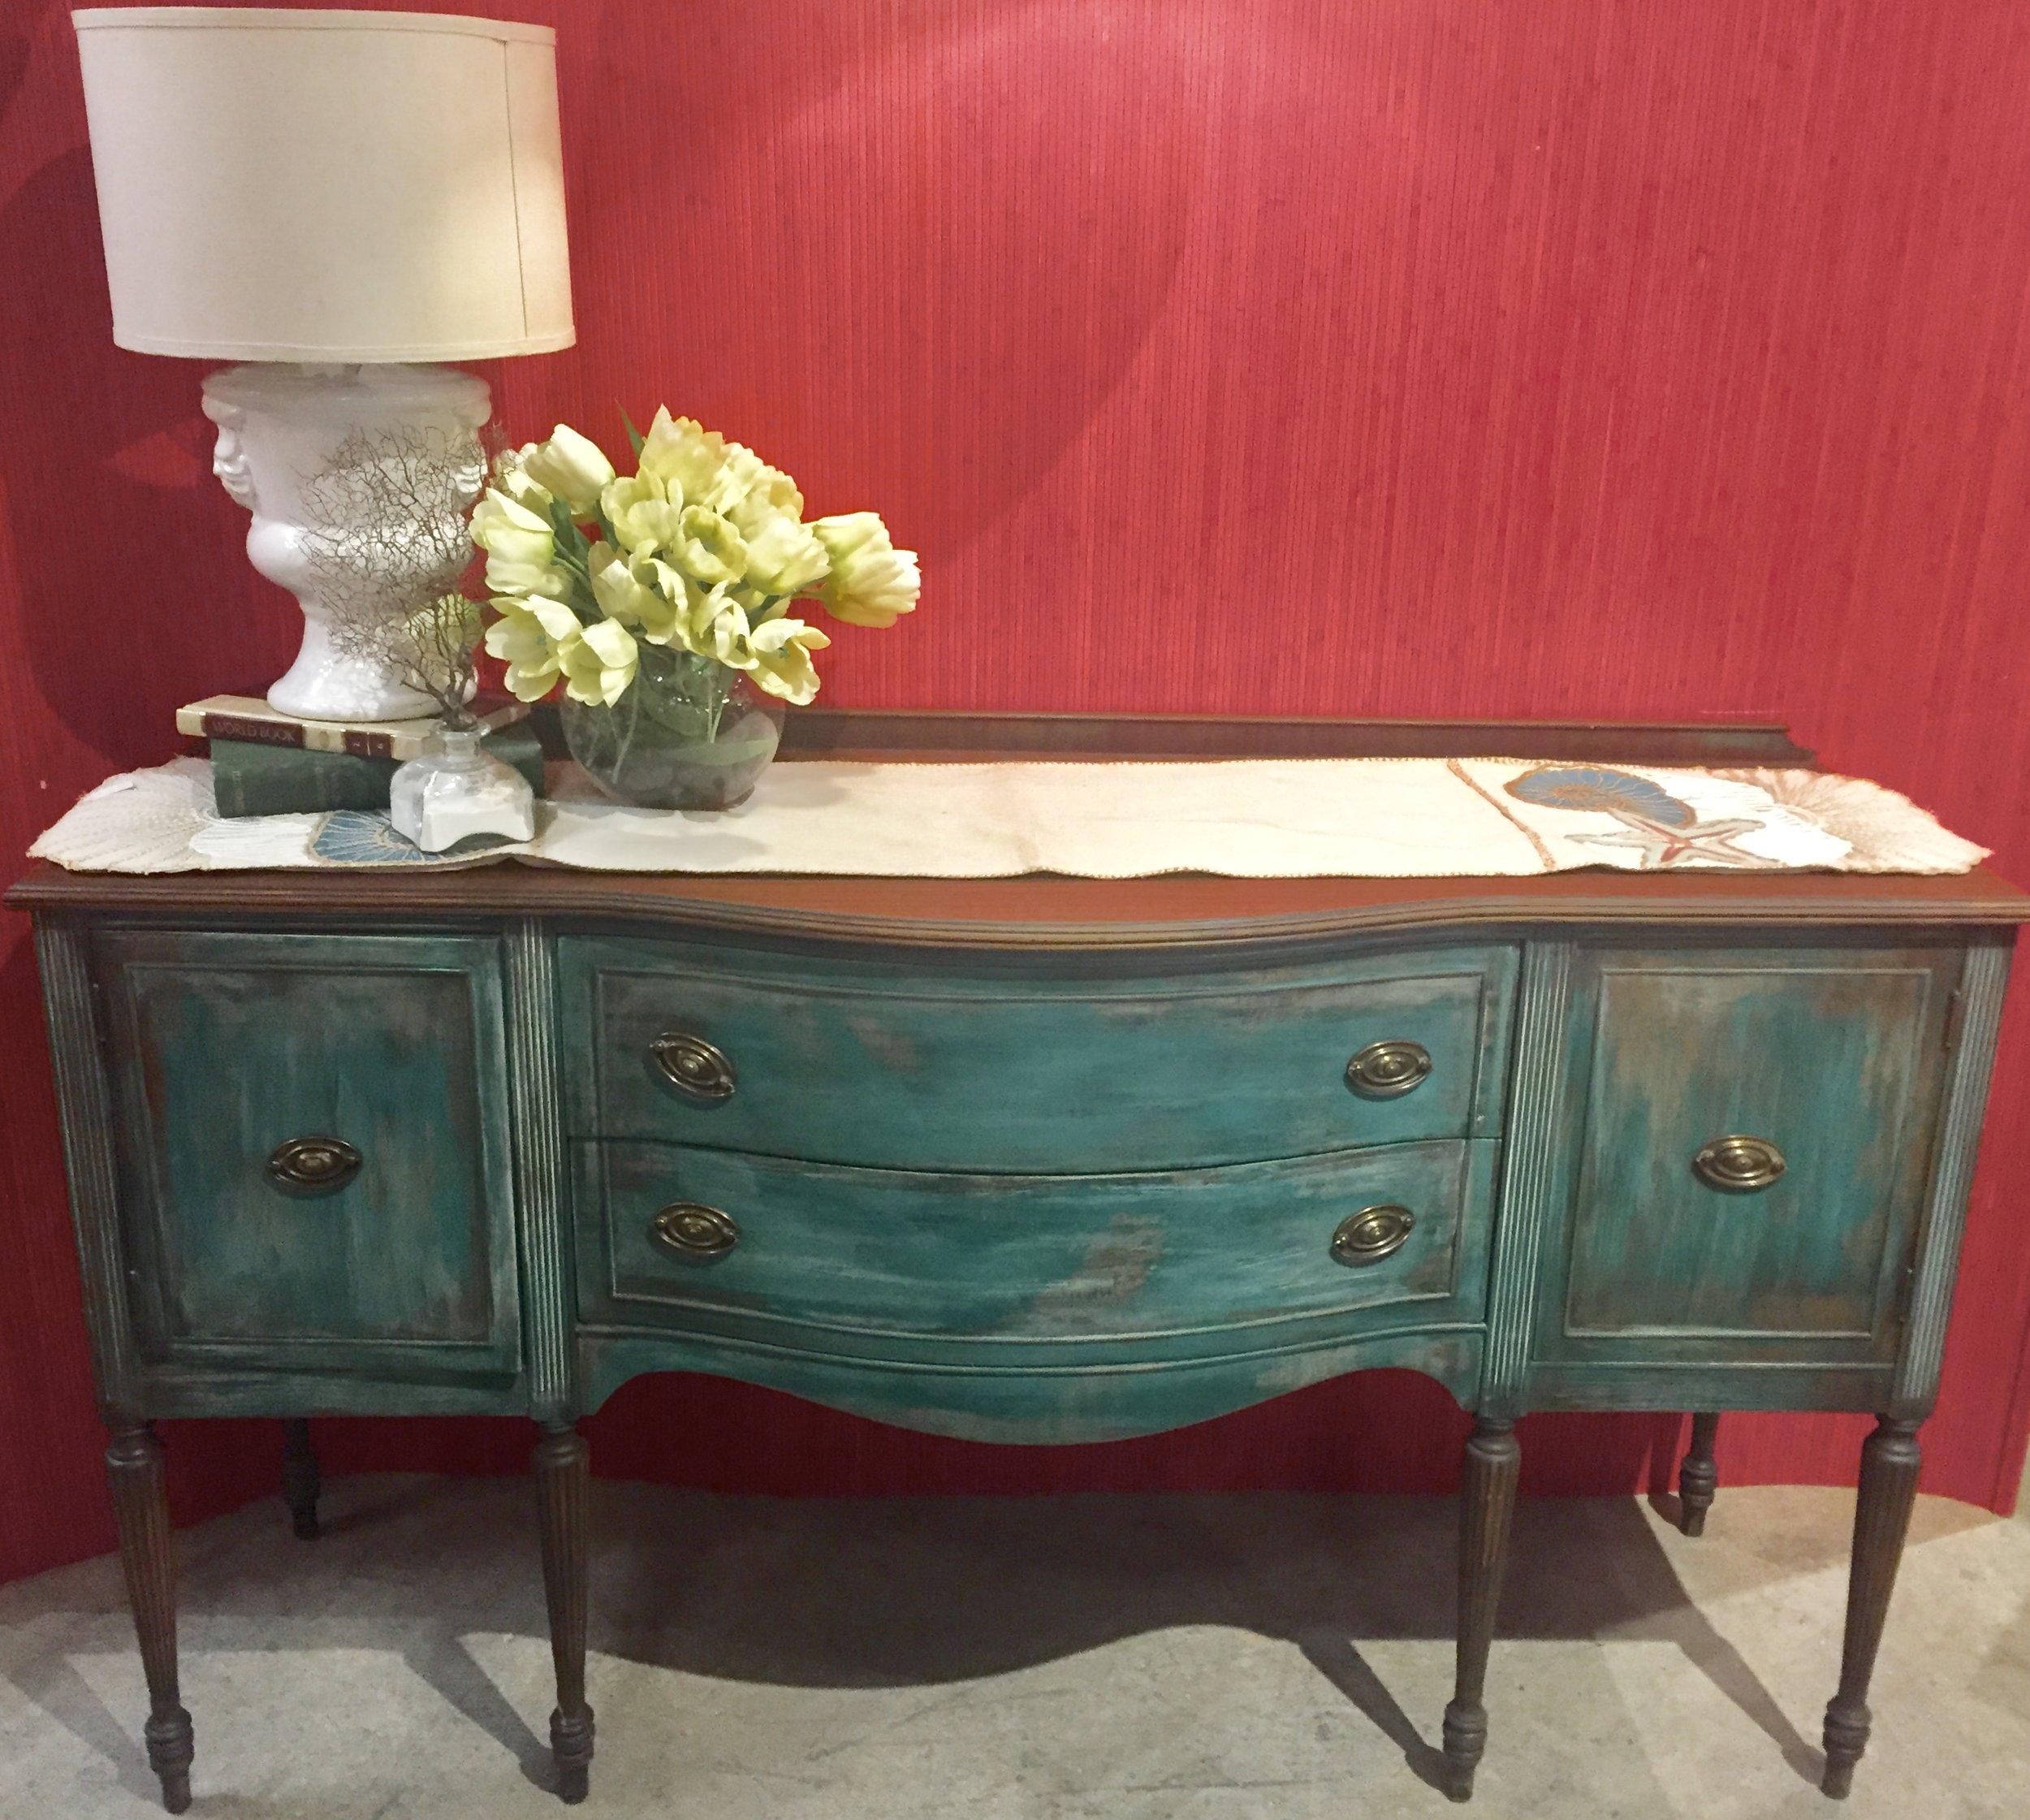 Painted Antique Buffet $549.00 - C1061 22433